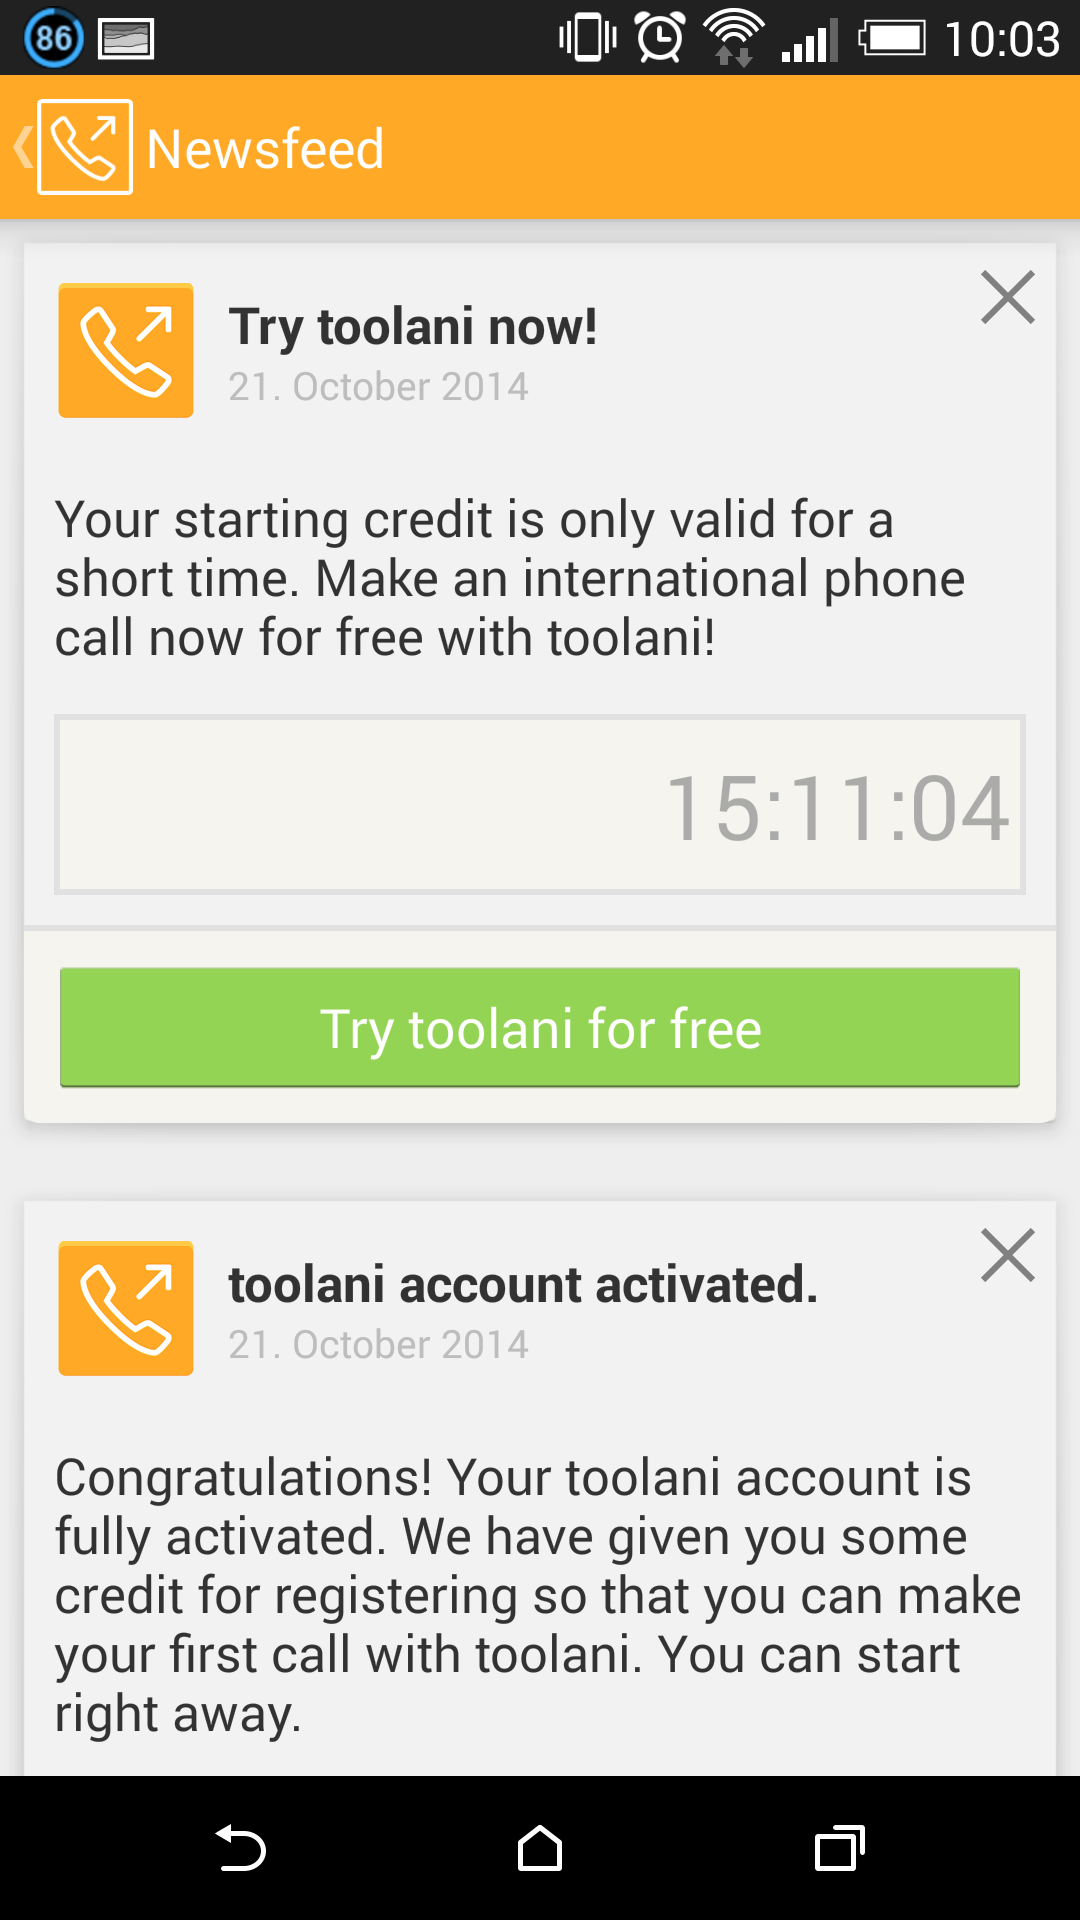 newsfeed inside toolani